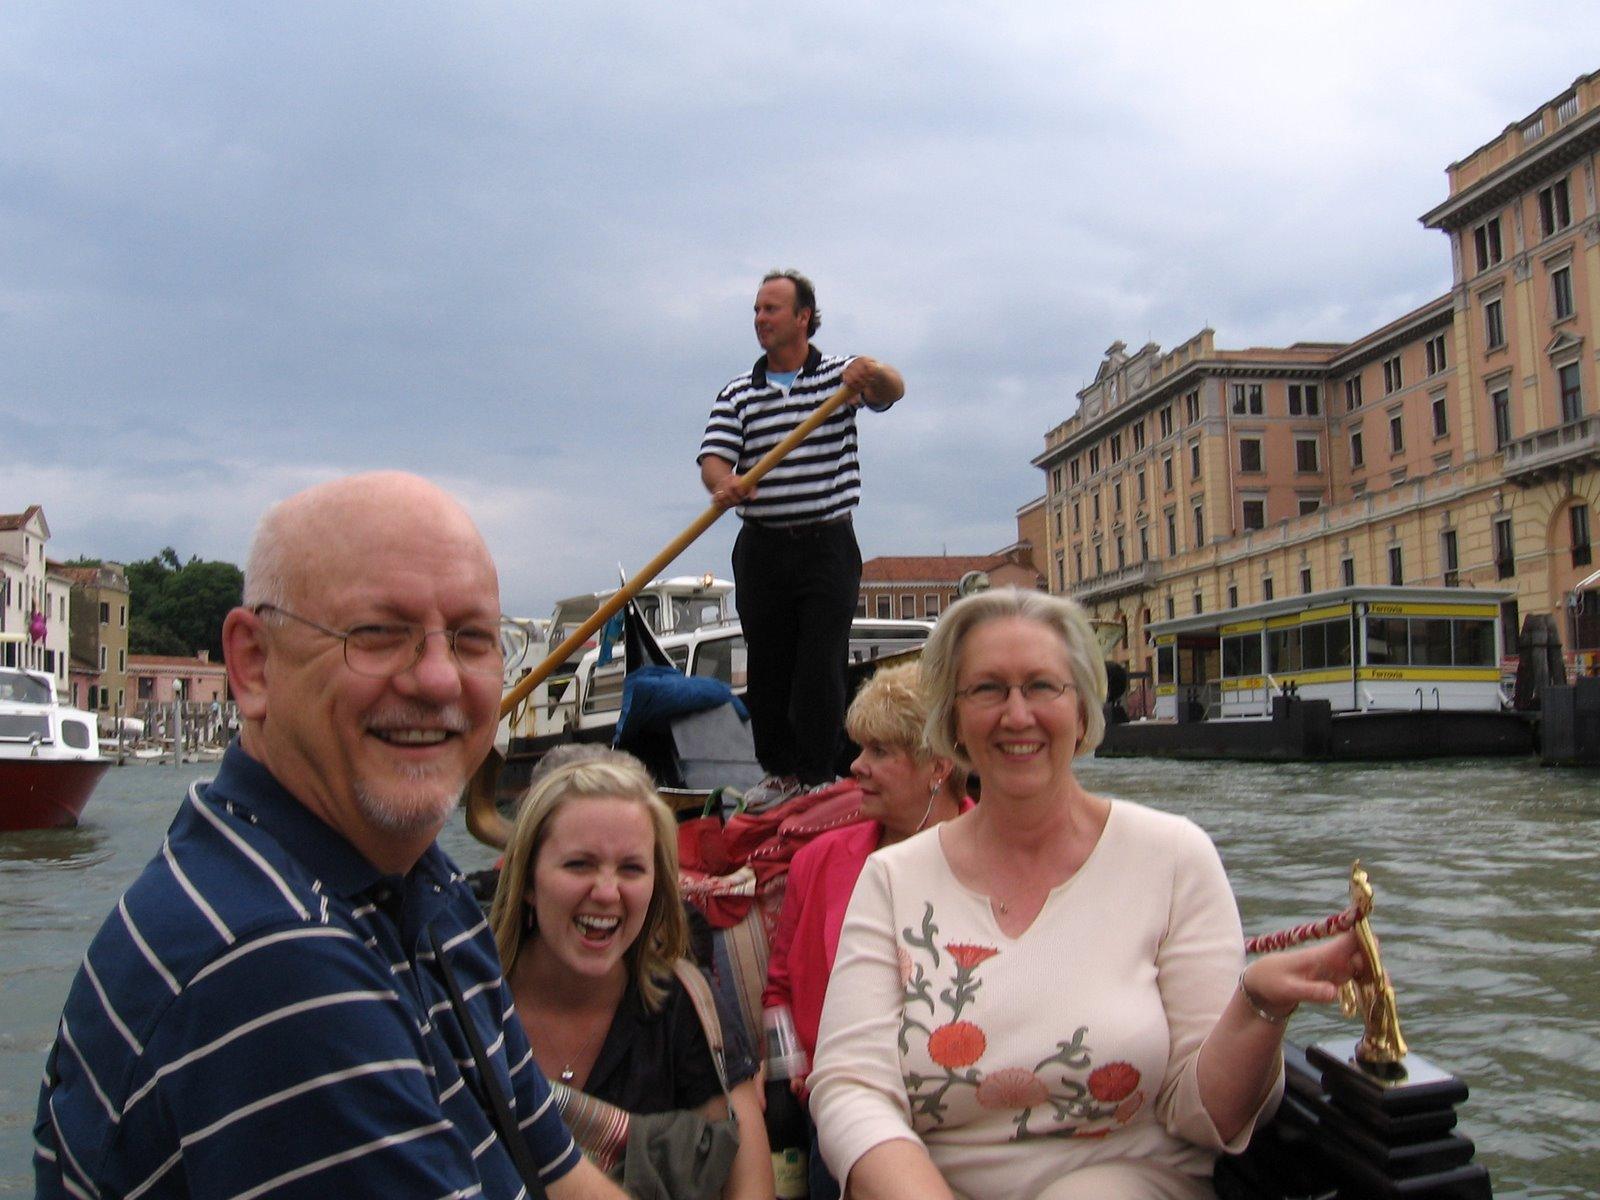 Dad,+Evan+&+Mom+on+the+gondola+in+Venice,+Italy.jpg (image)